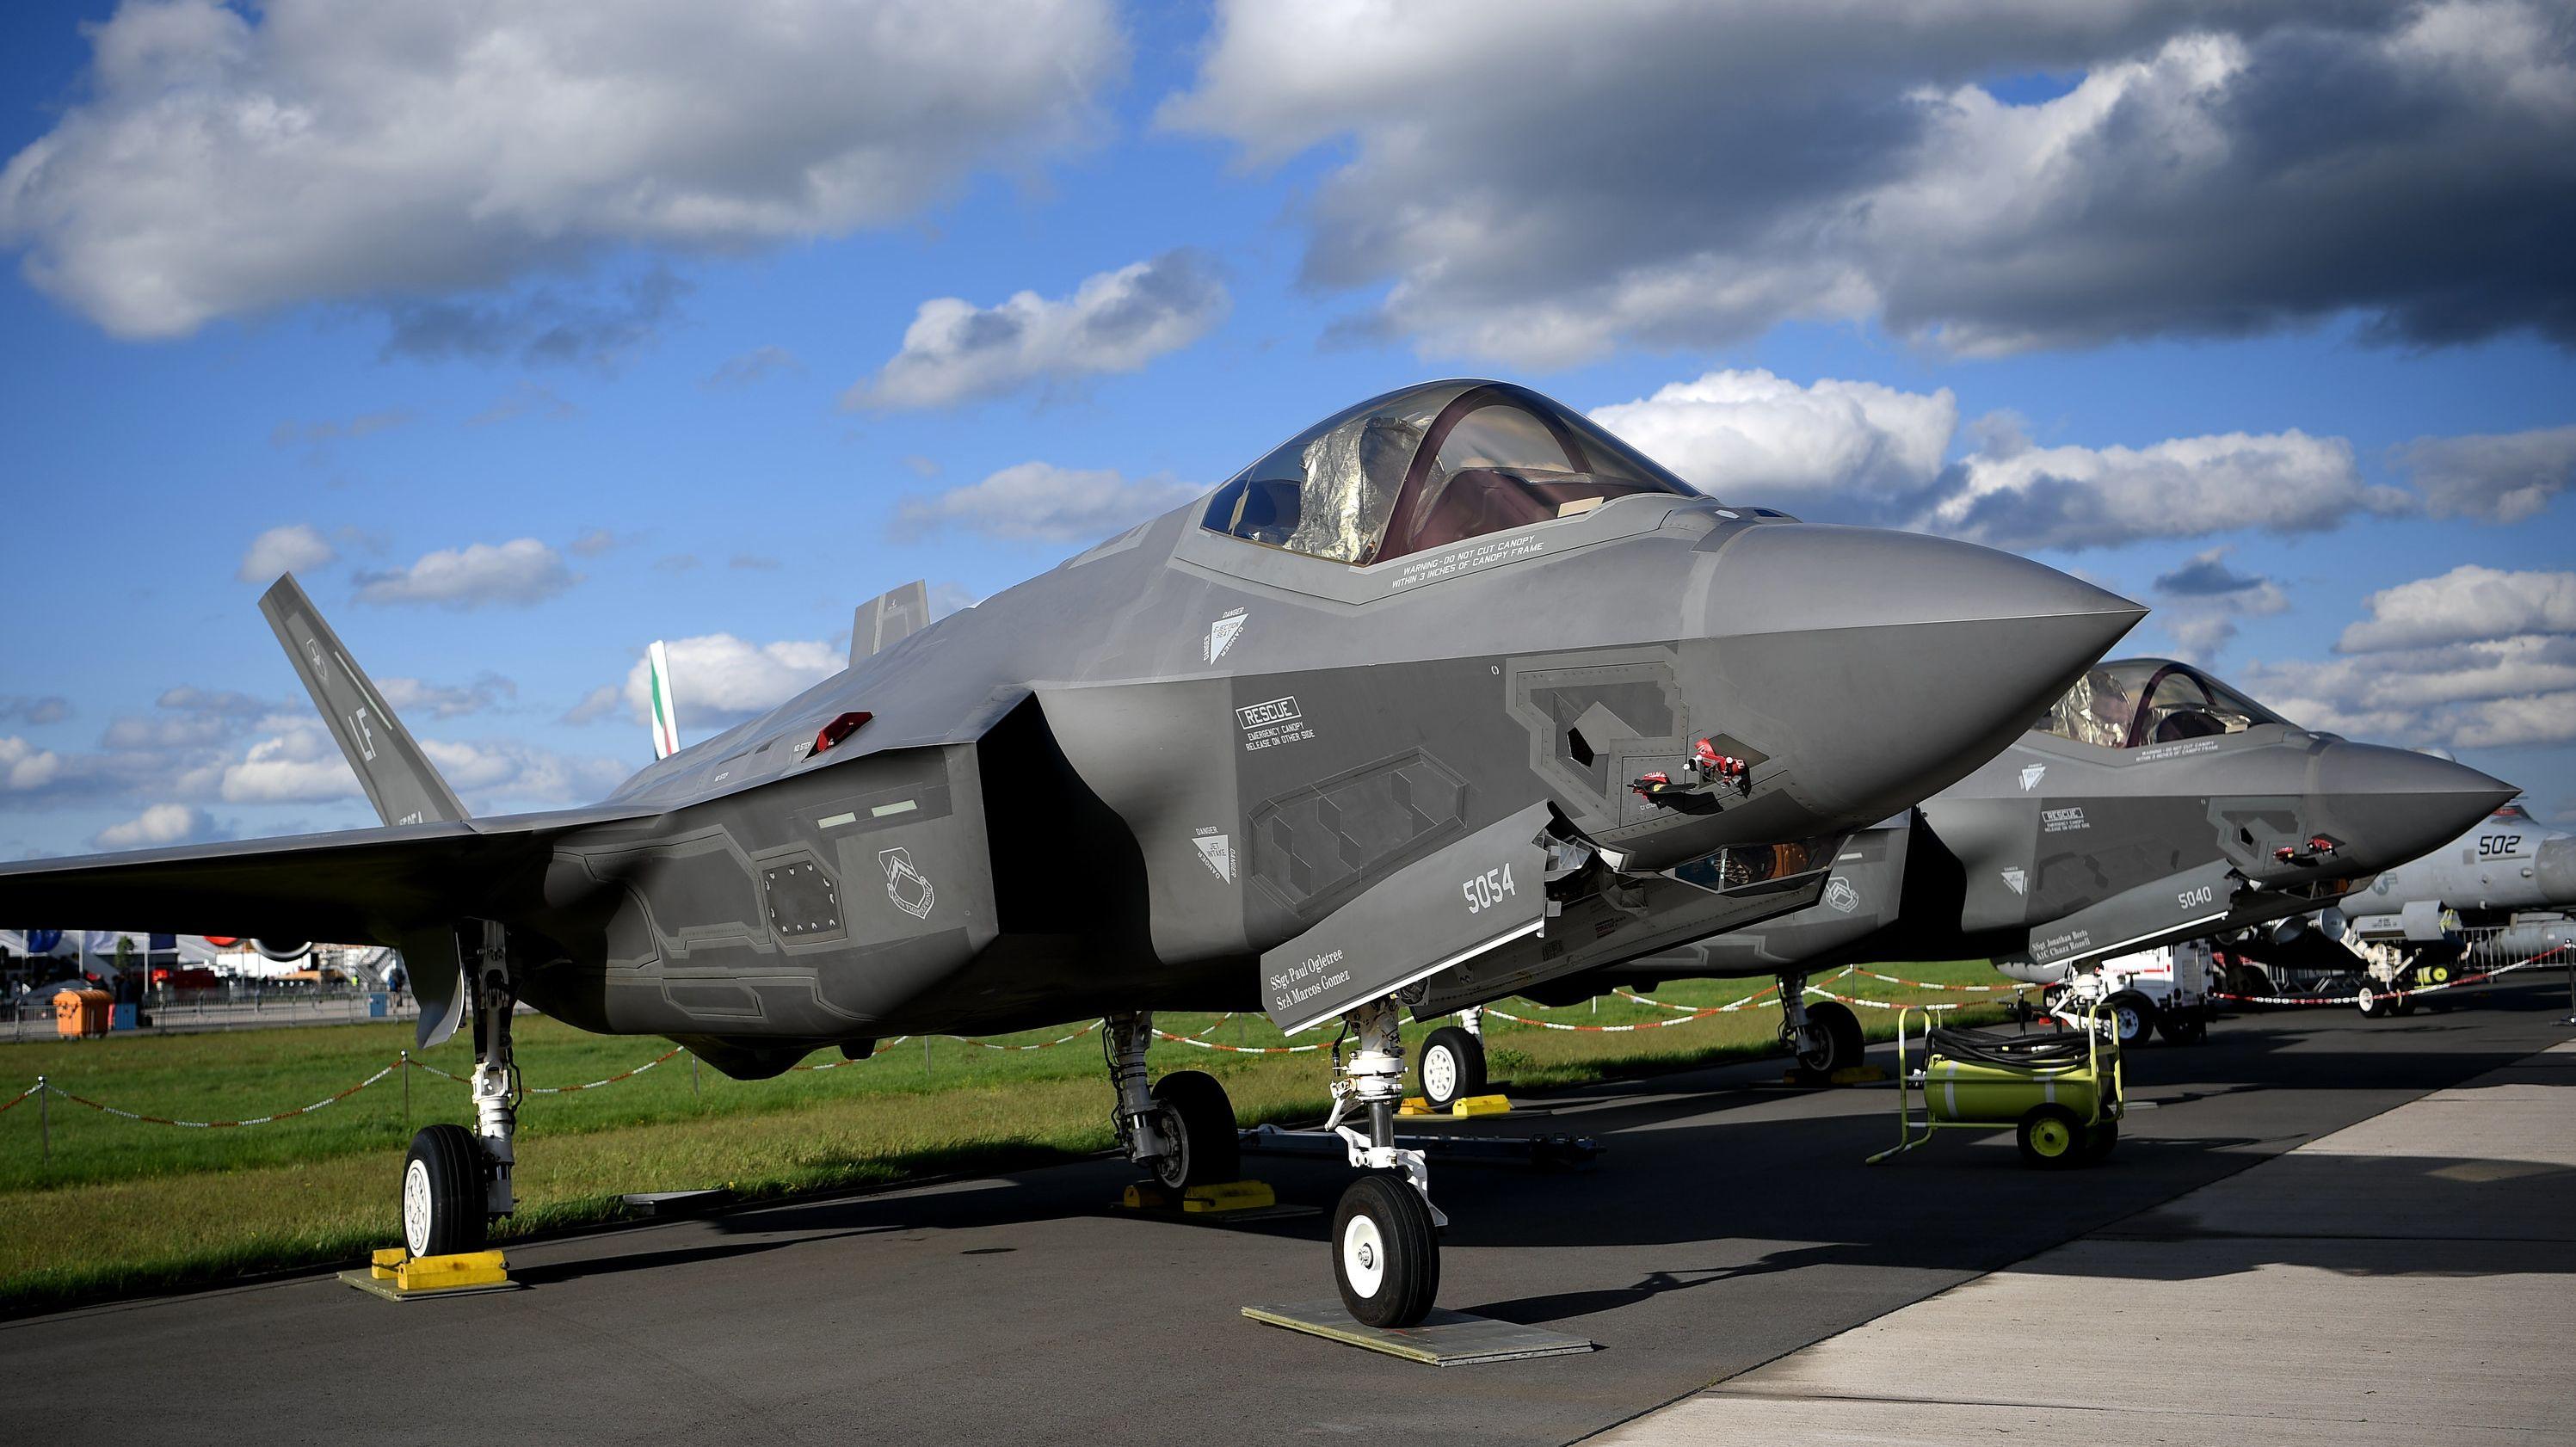 Ein Lockheed Martin F-35 Tarnkappenjet aus den USA